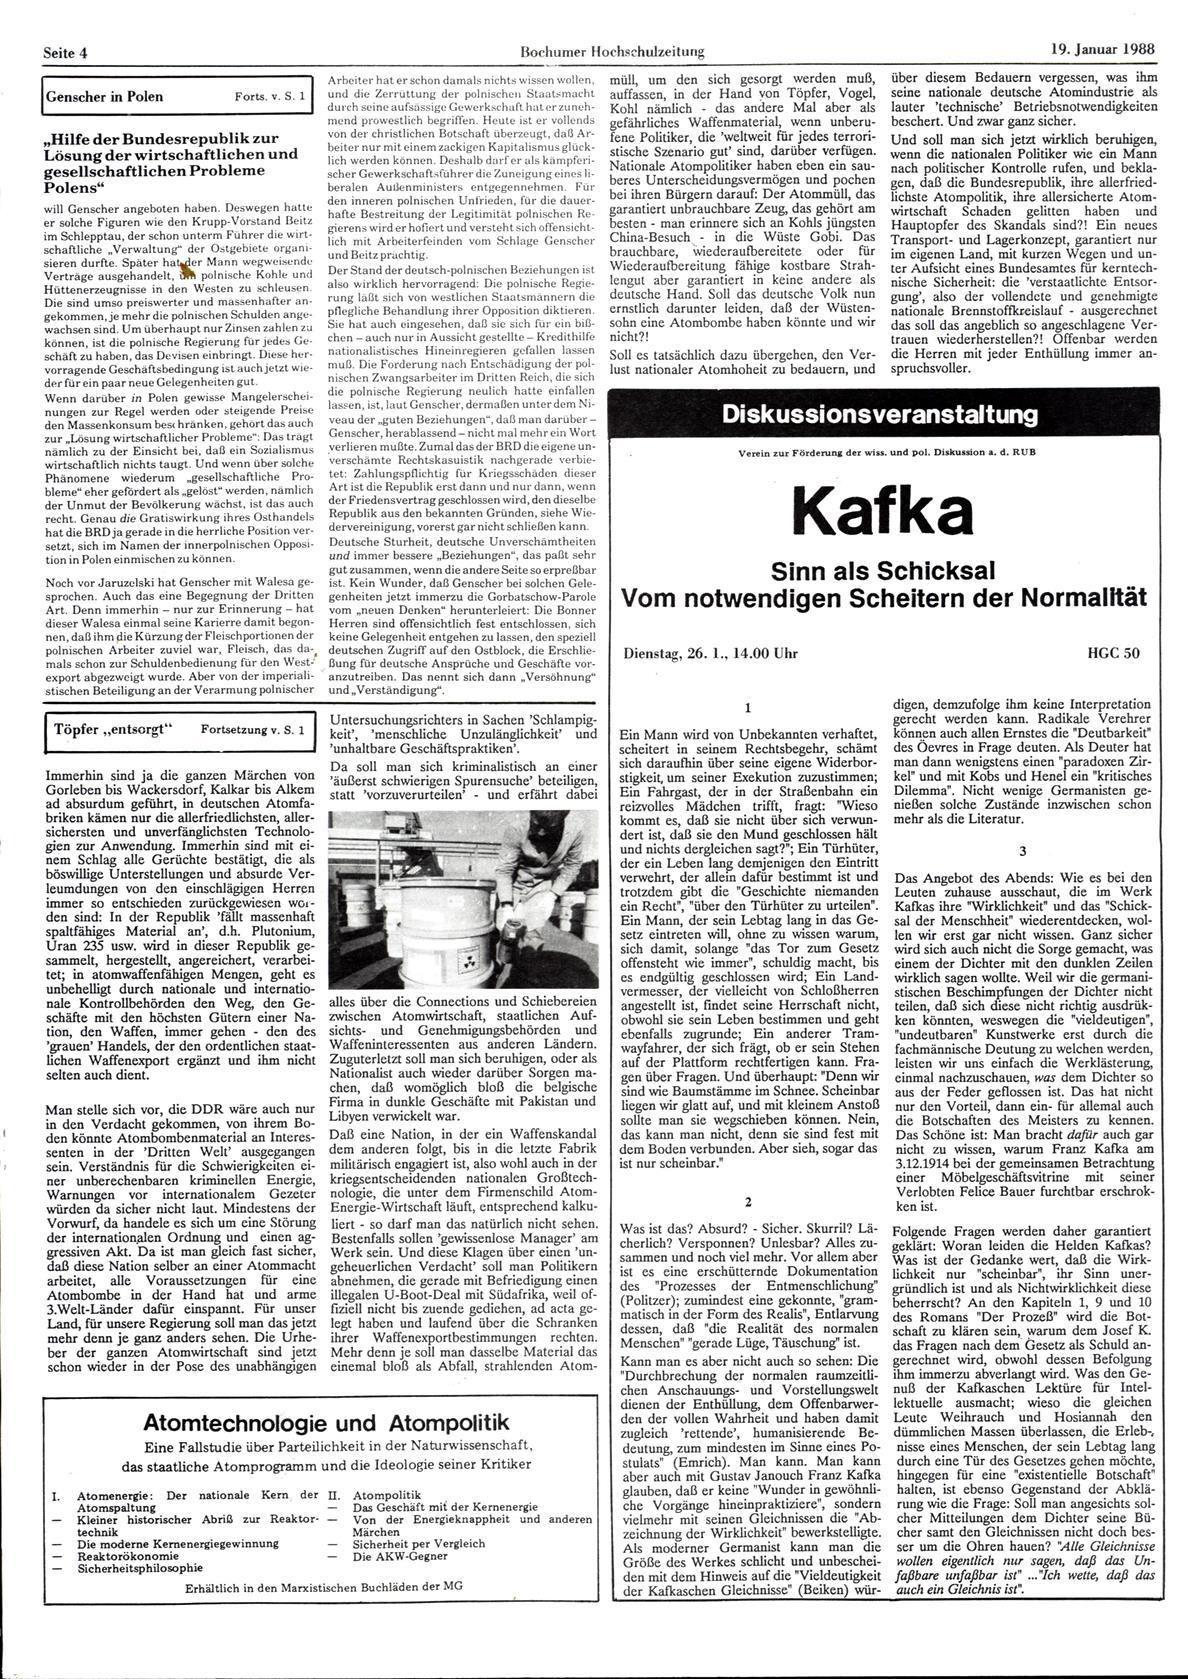 Bochum_BHZ_19880119_163_004